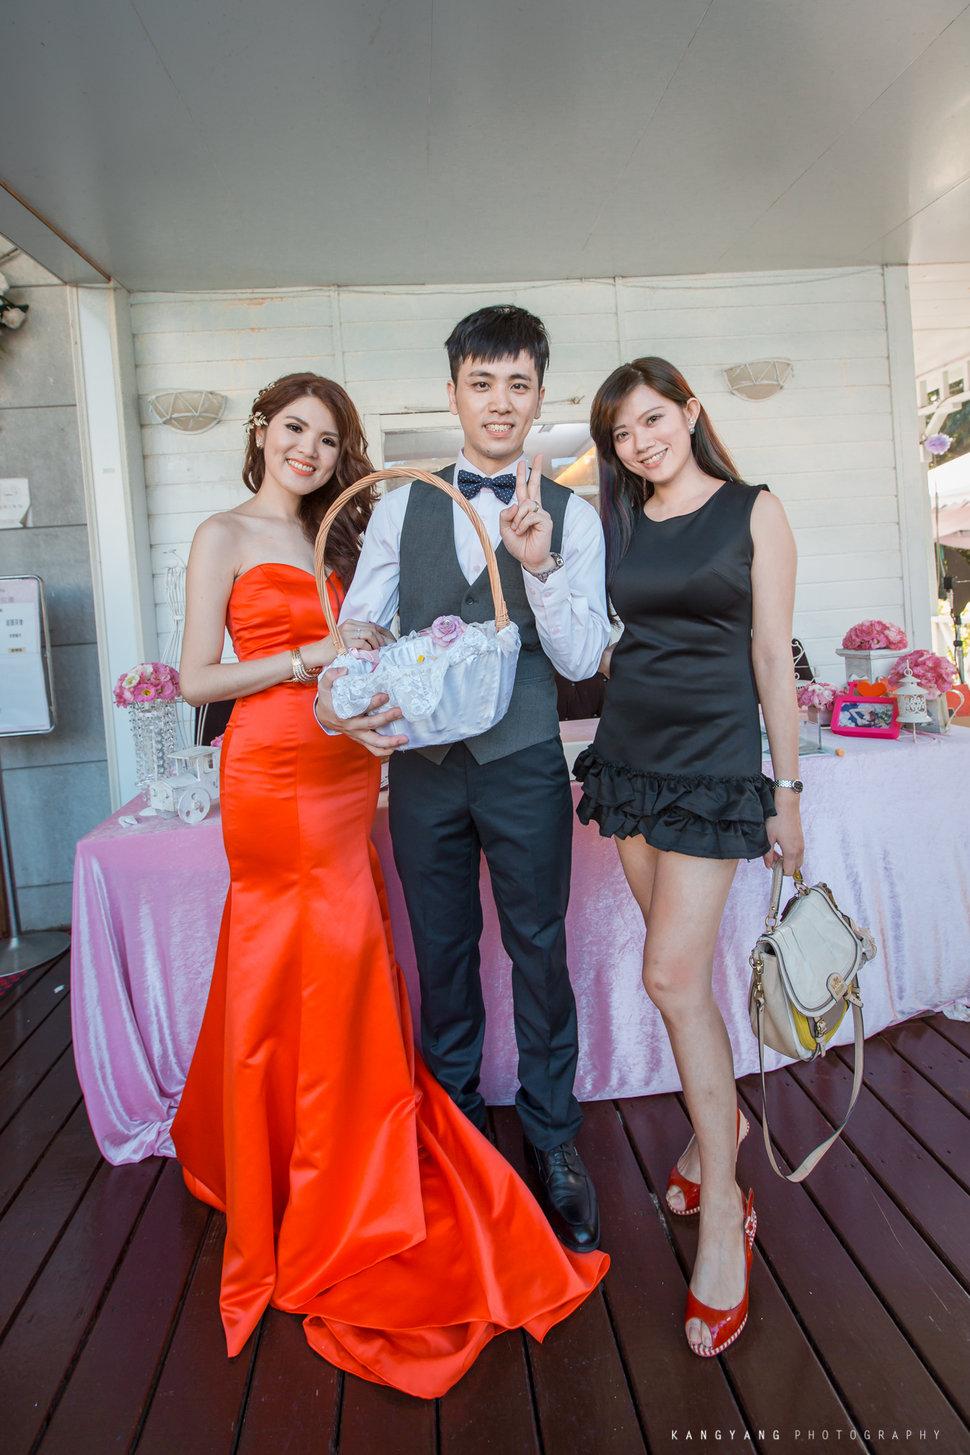 U&M 戶外證婚教堂婚禮@台北青青食尚花園/費加洛教堂(編號:307178) - 婚攝楊康影像Kstudio《結婚吧》